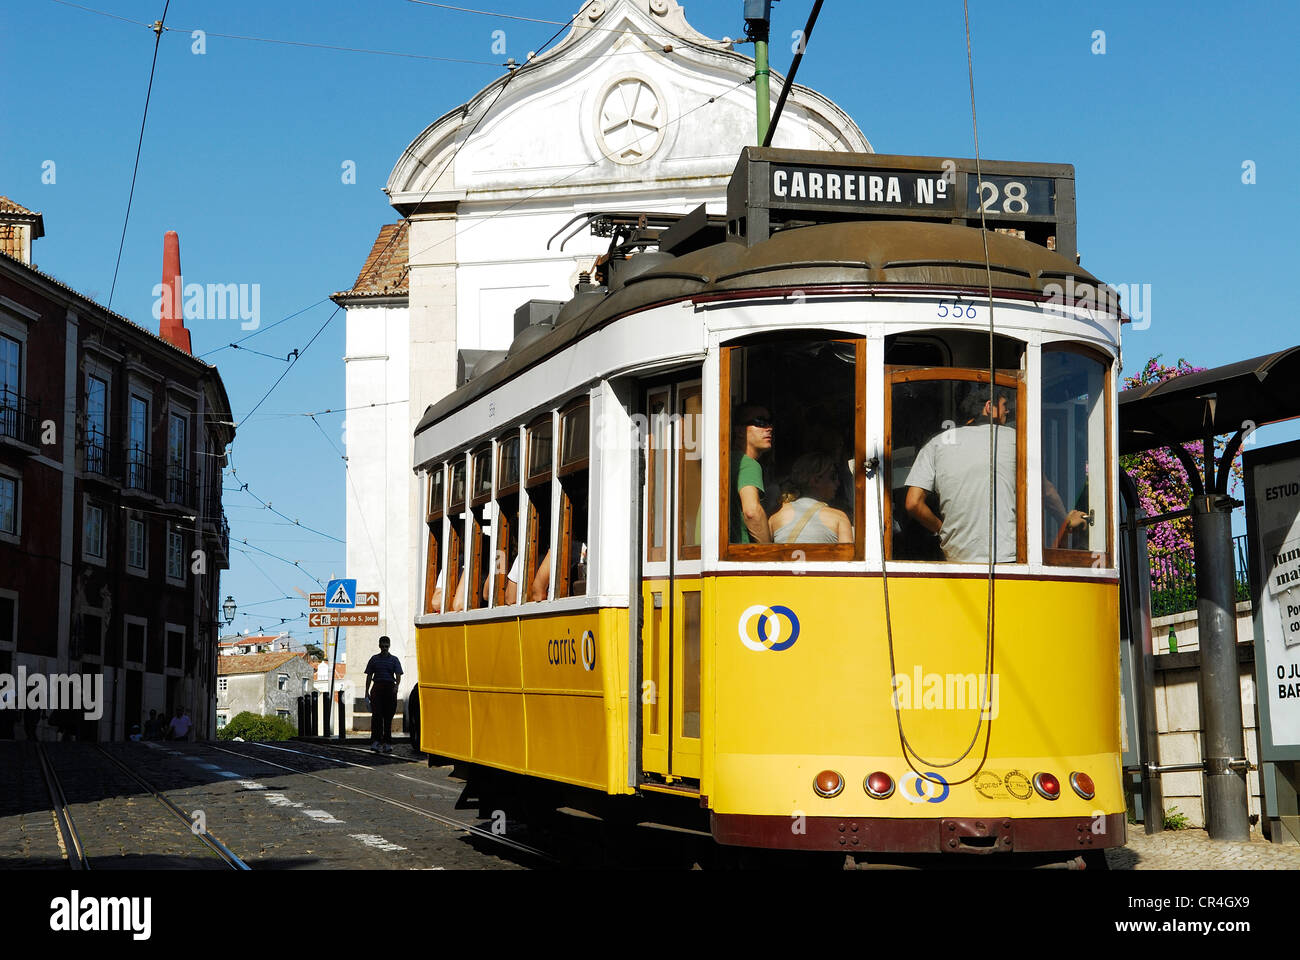 Portugal, Lisbon, Alfama District, passing of tramway along the la rua do Limoeiro in front of the Santa Luzia Church Stock Photo